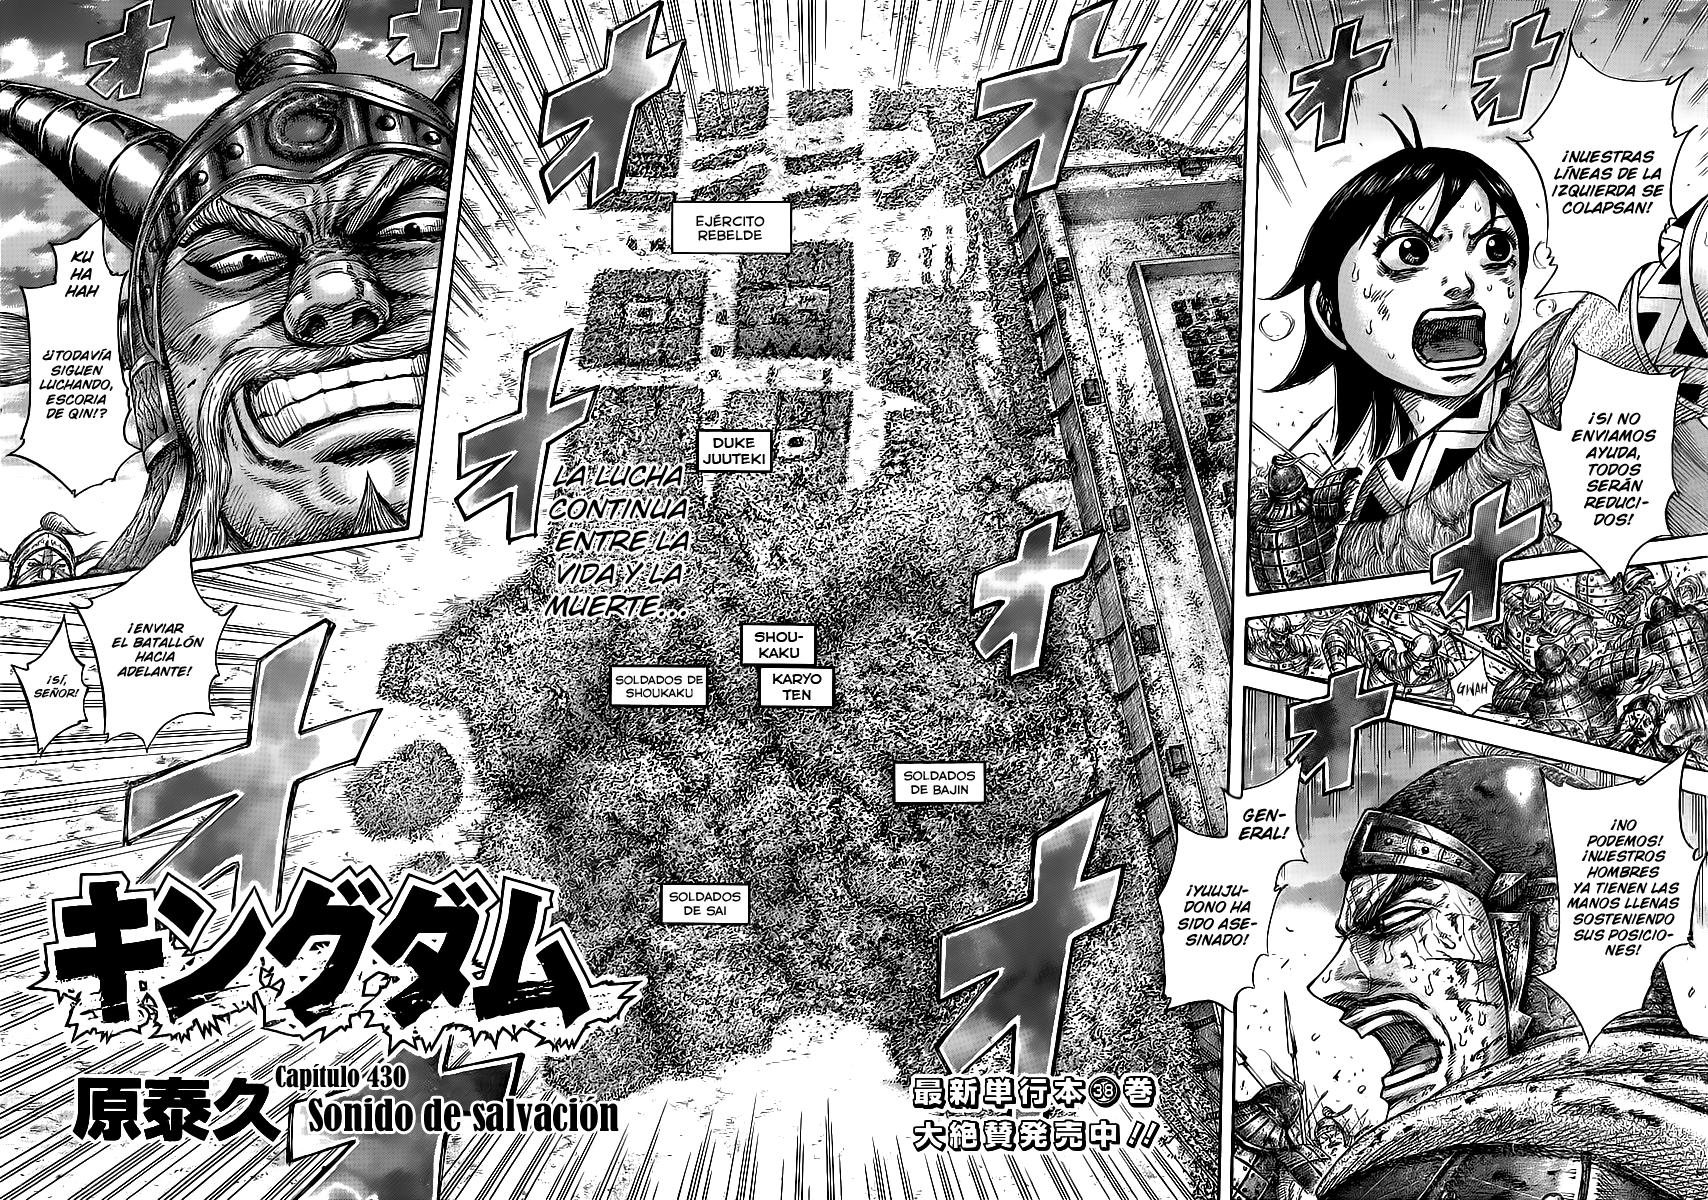 http://c5.ninemanga.com/es_manga/19/12307/367445/5d3145e1226fd39ee3b3039bfa90c95d.jpg Page 3